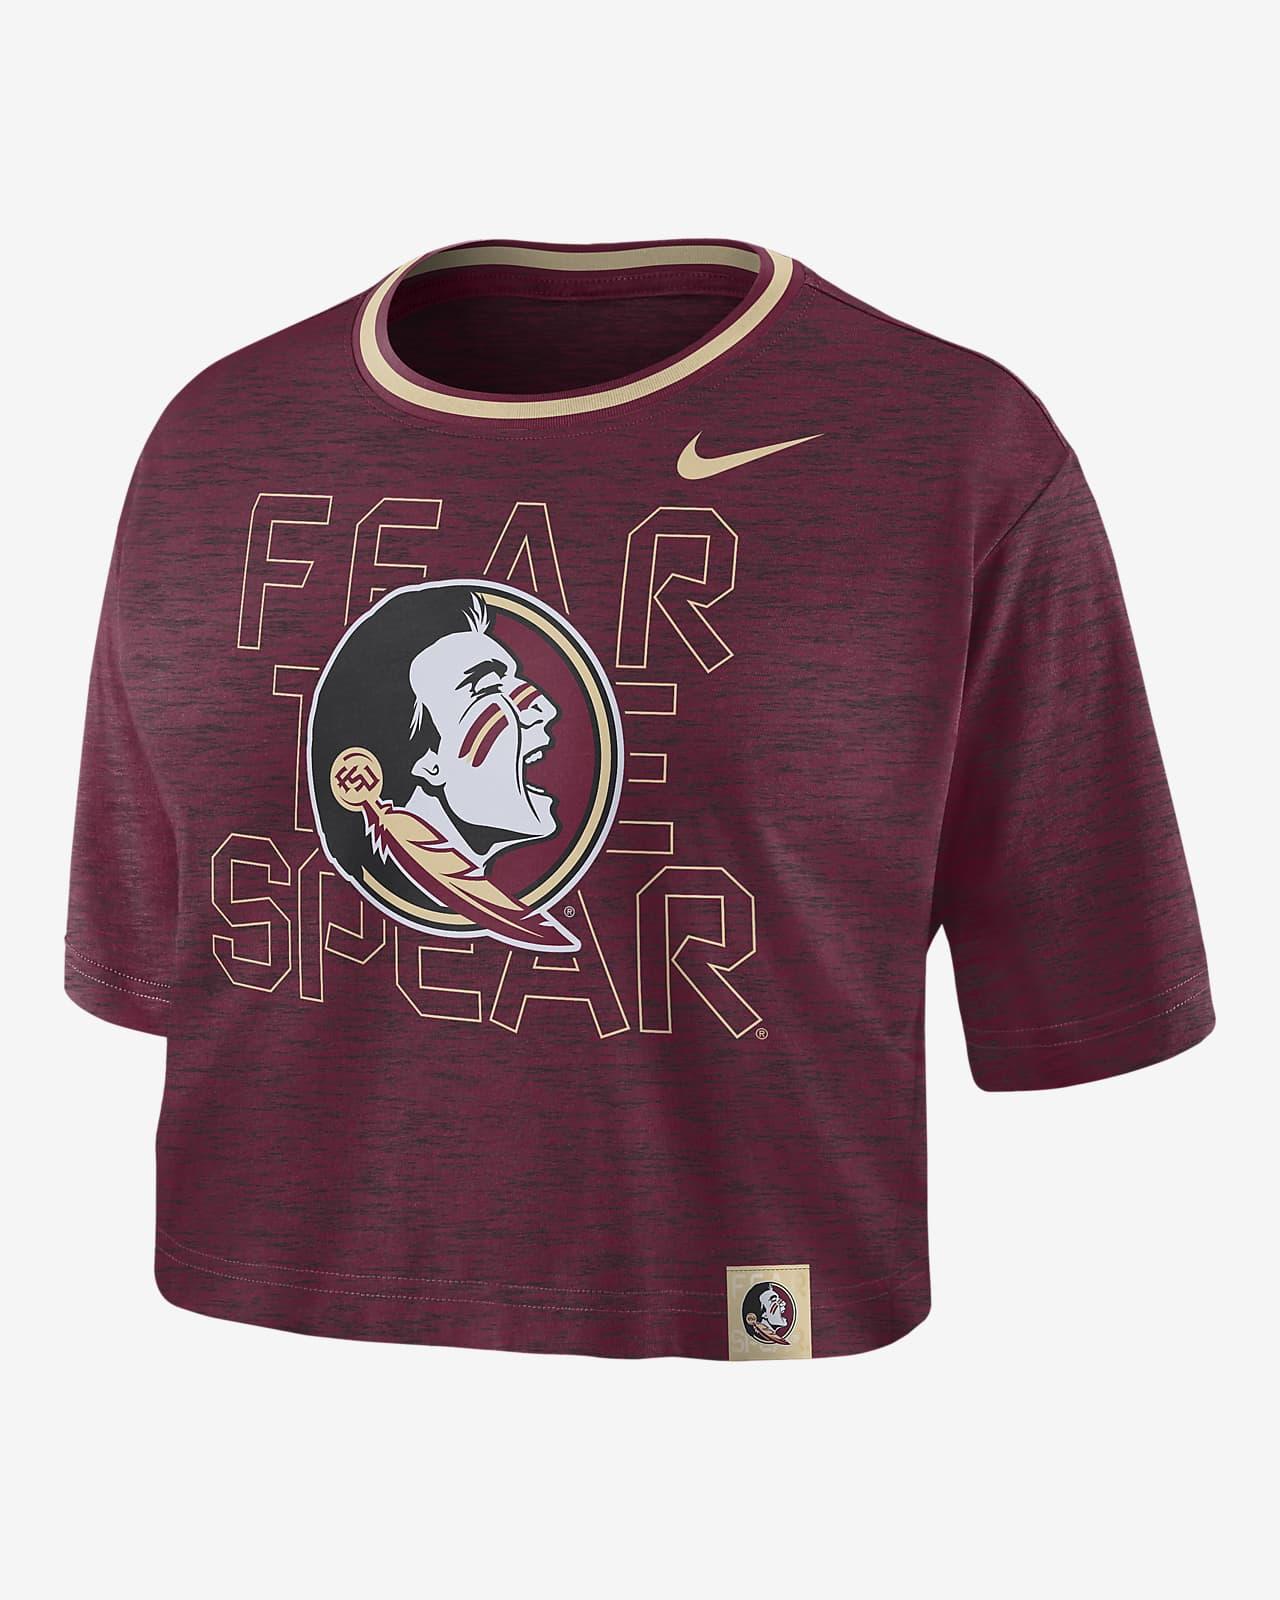 Nike College (Florida State) Women's Crop T-Shirt